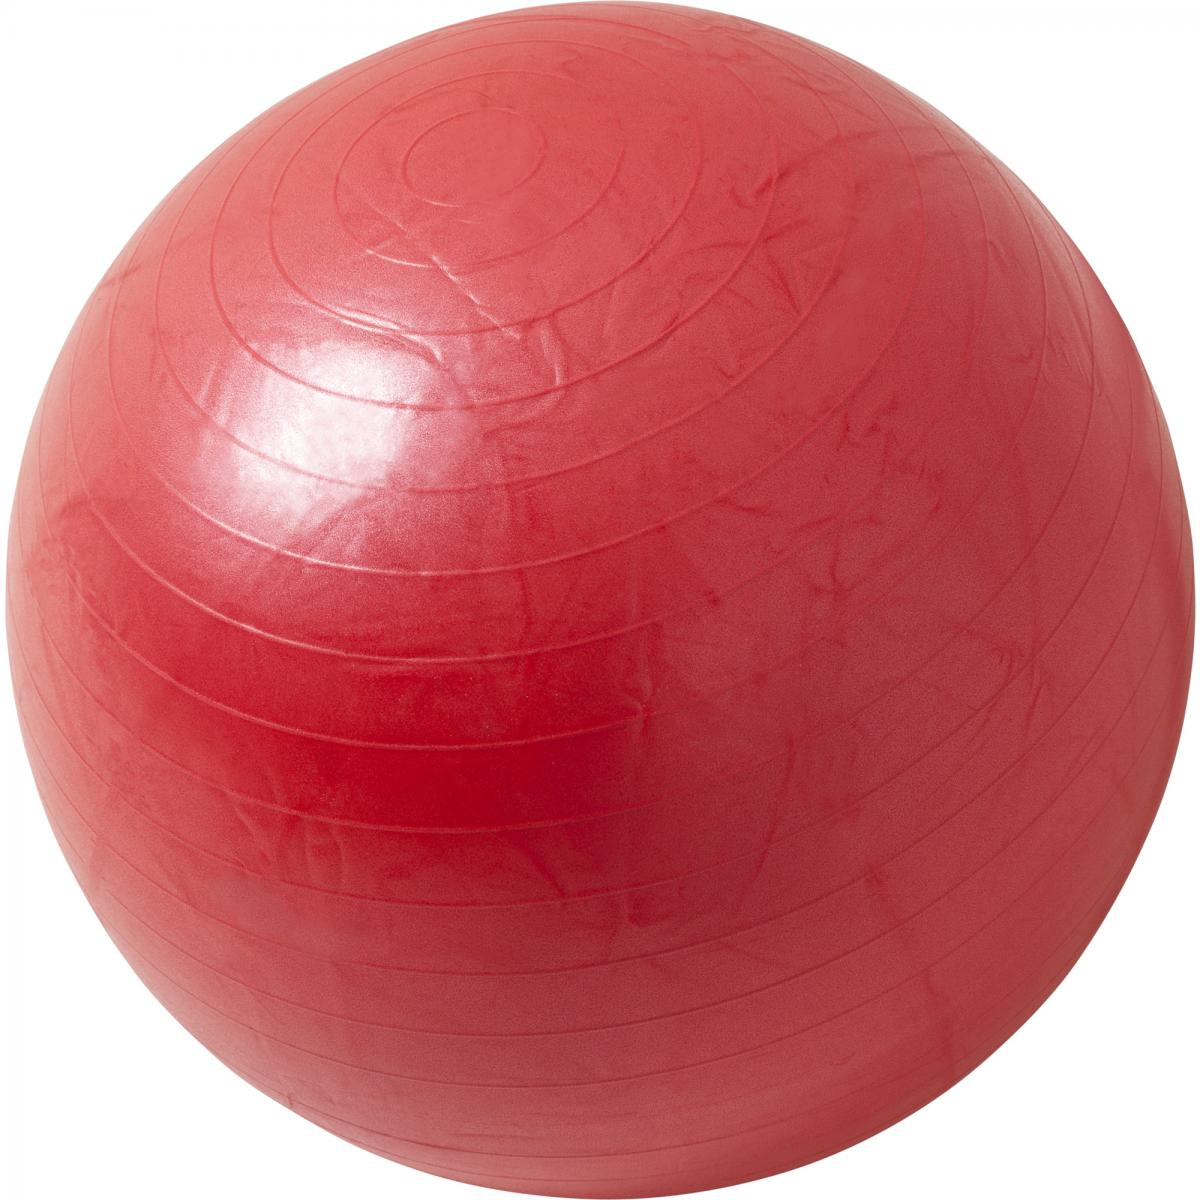 Gymnastikball Rot 55 cm